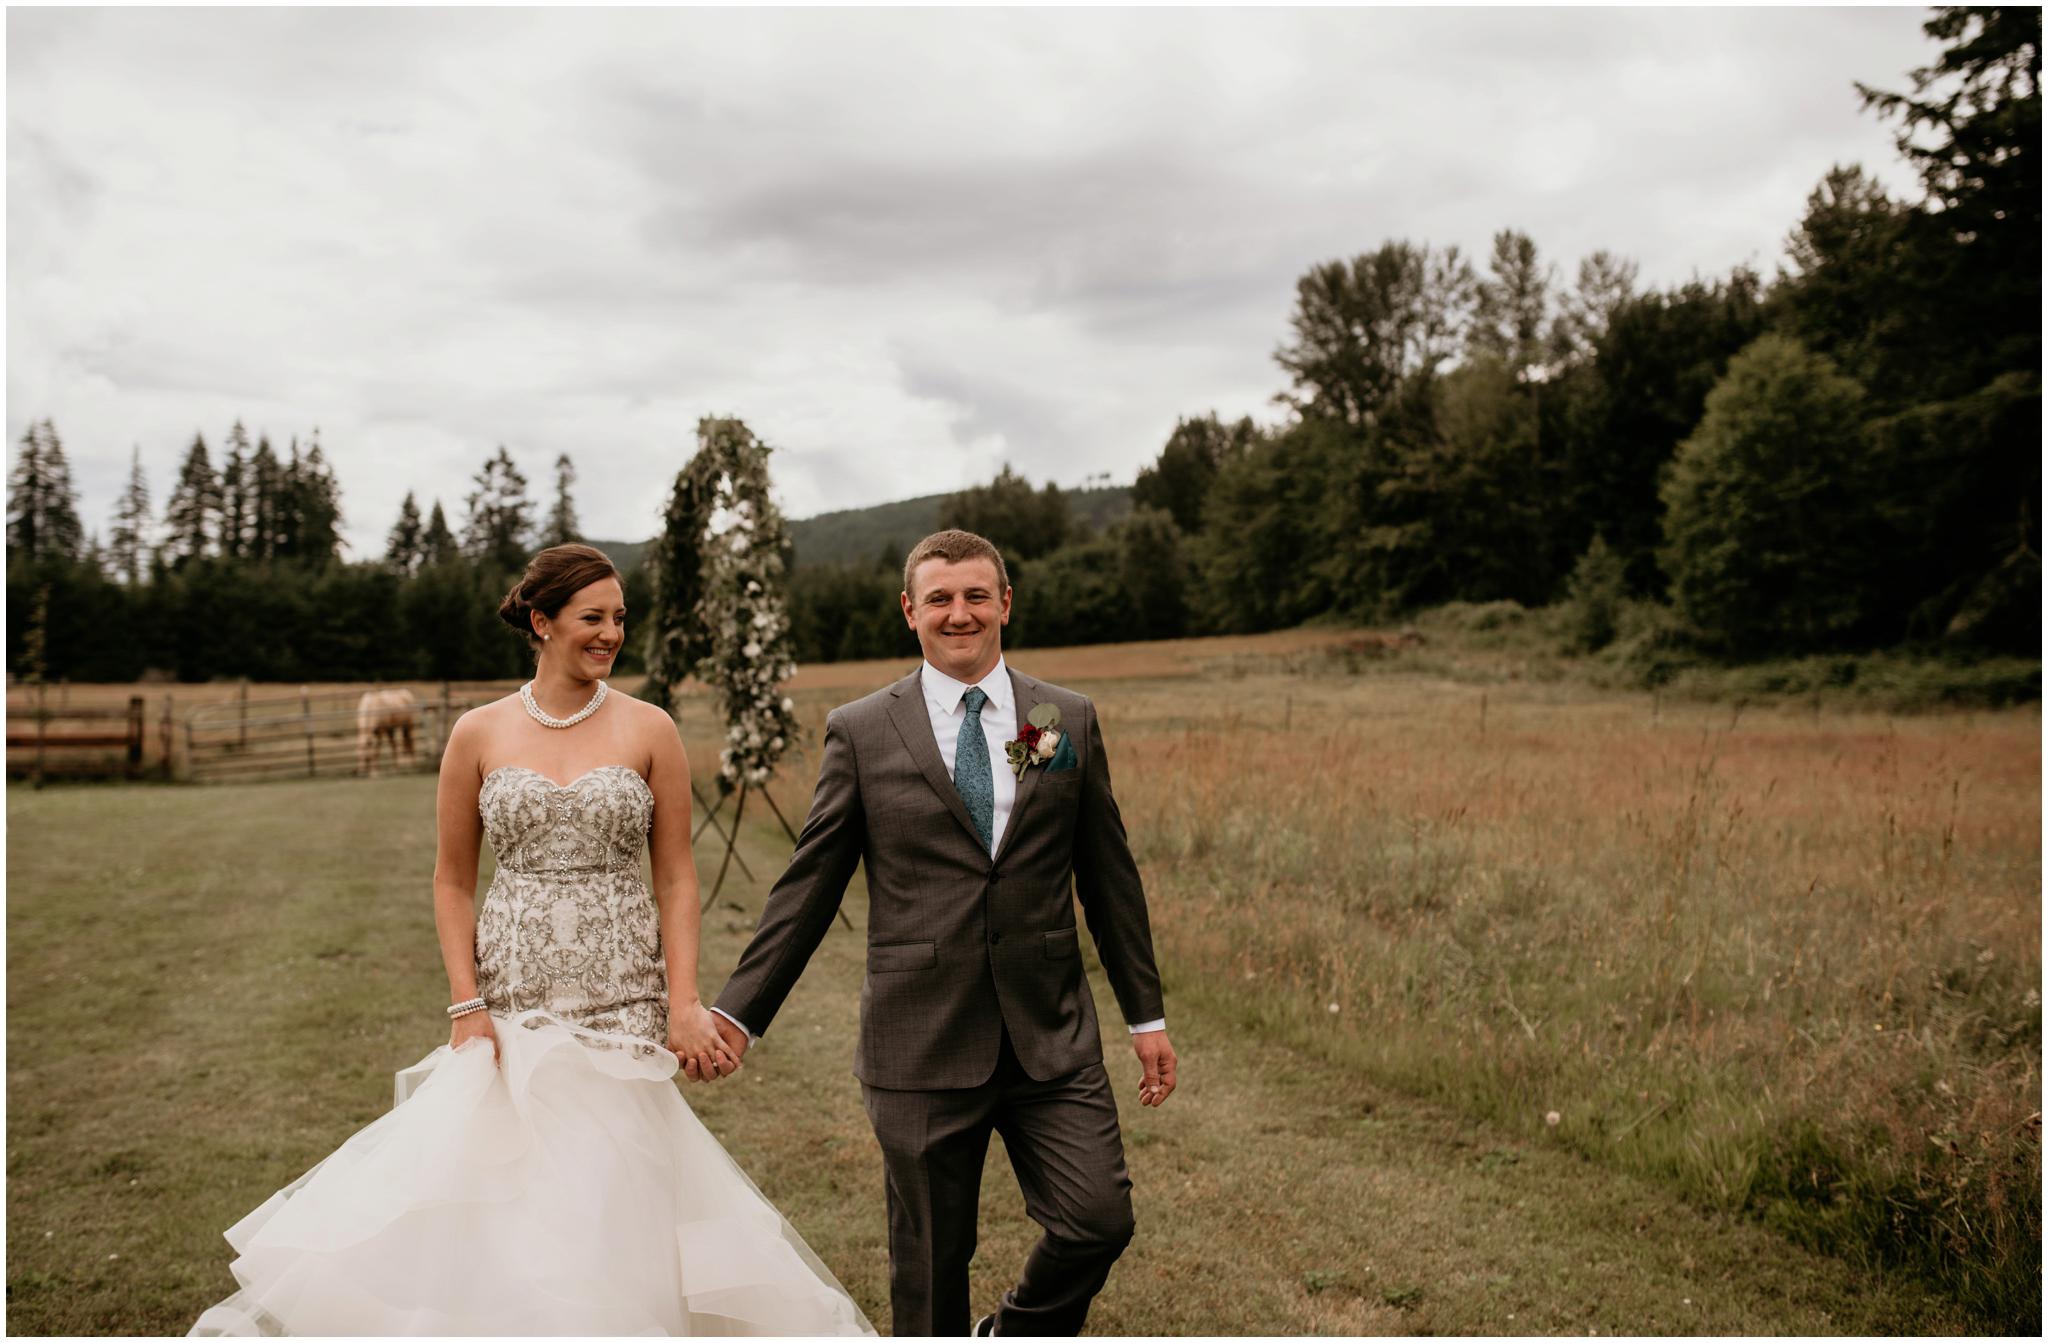 alex-and-matthew-three-cs-farm-venue-seattle-wedding-photographer-057.jpg